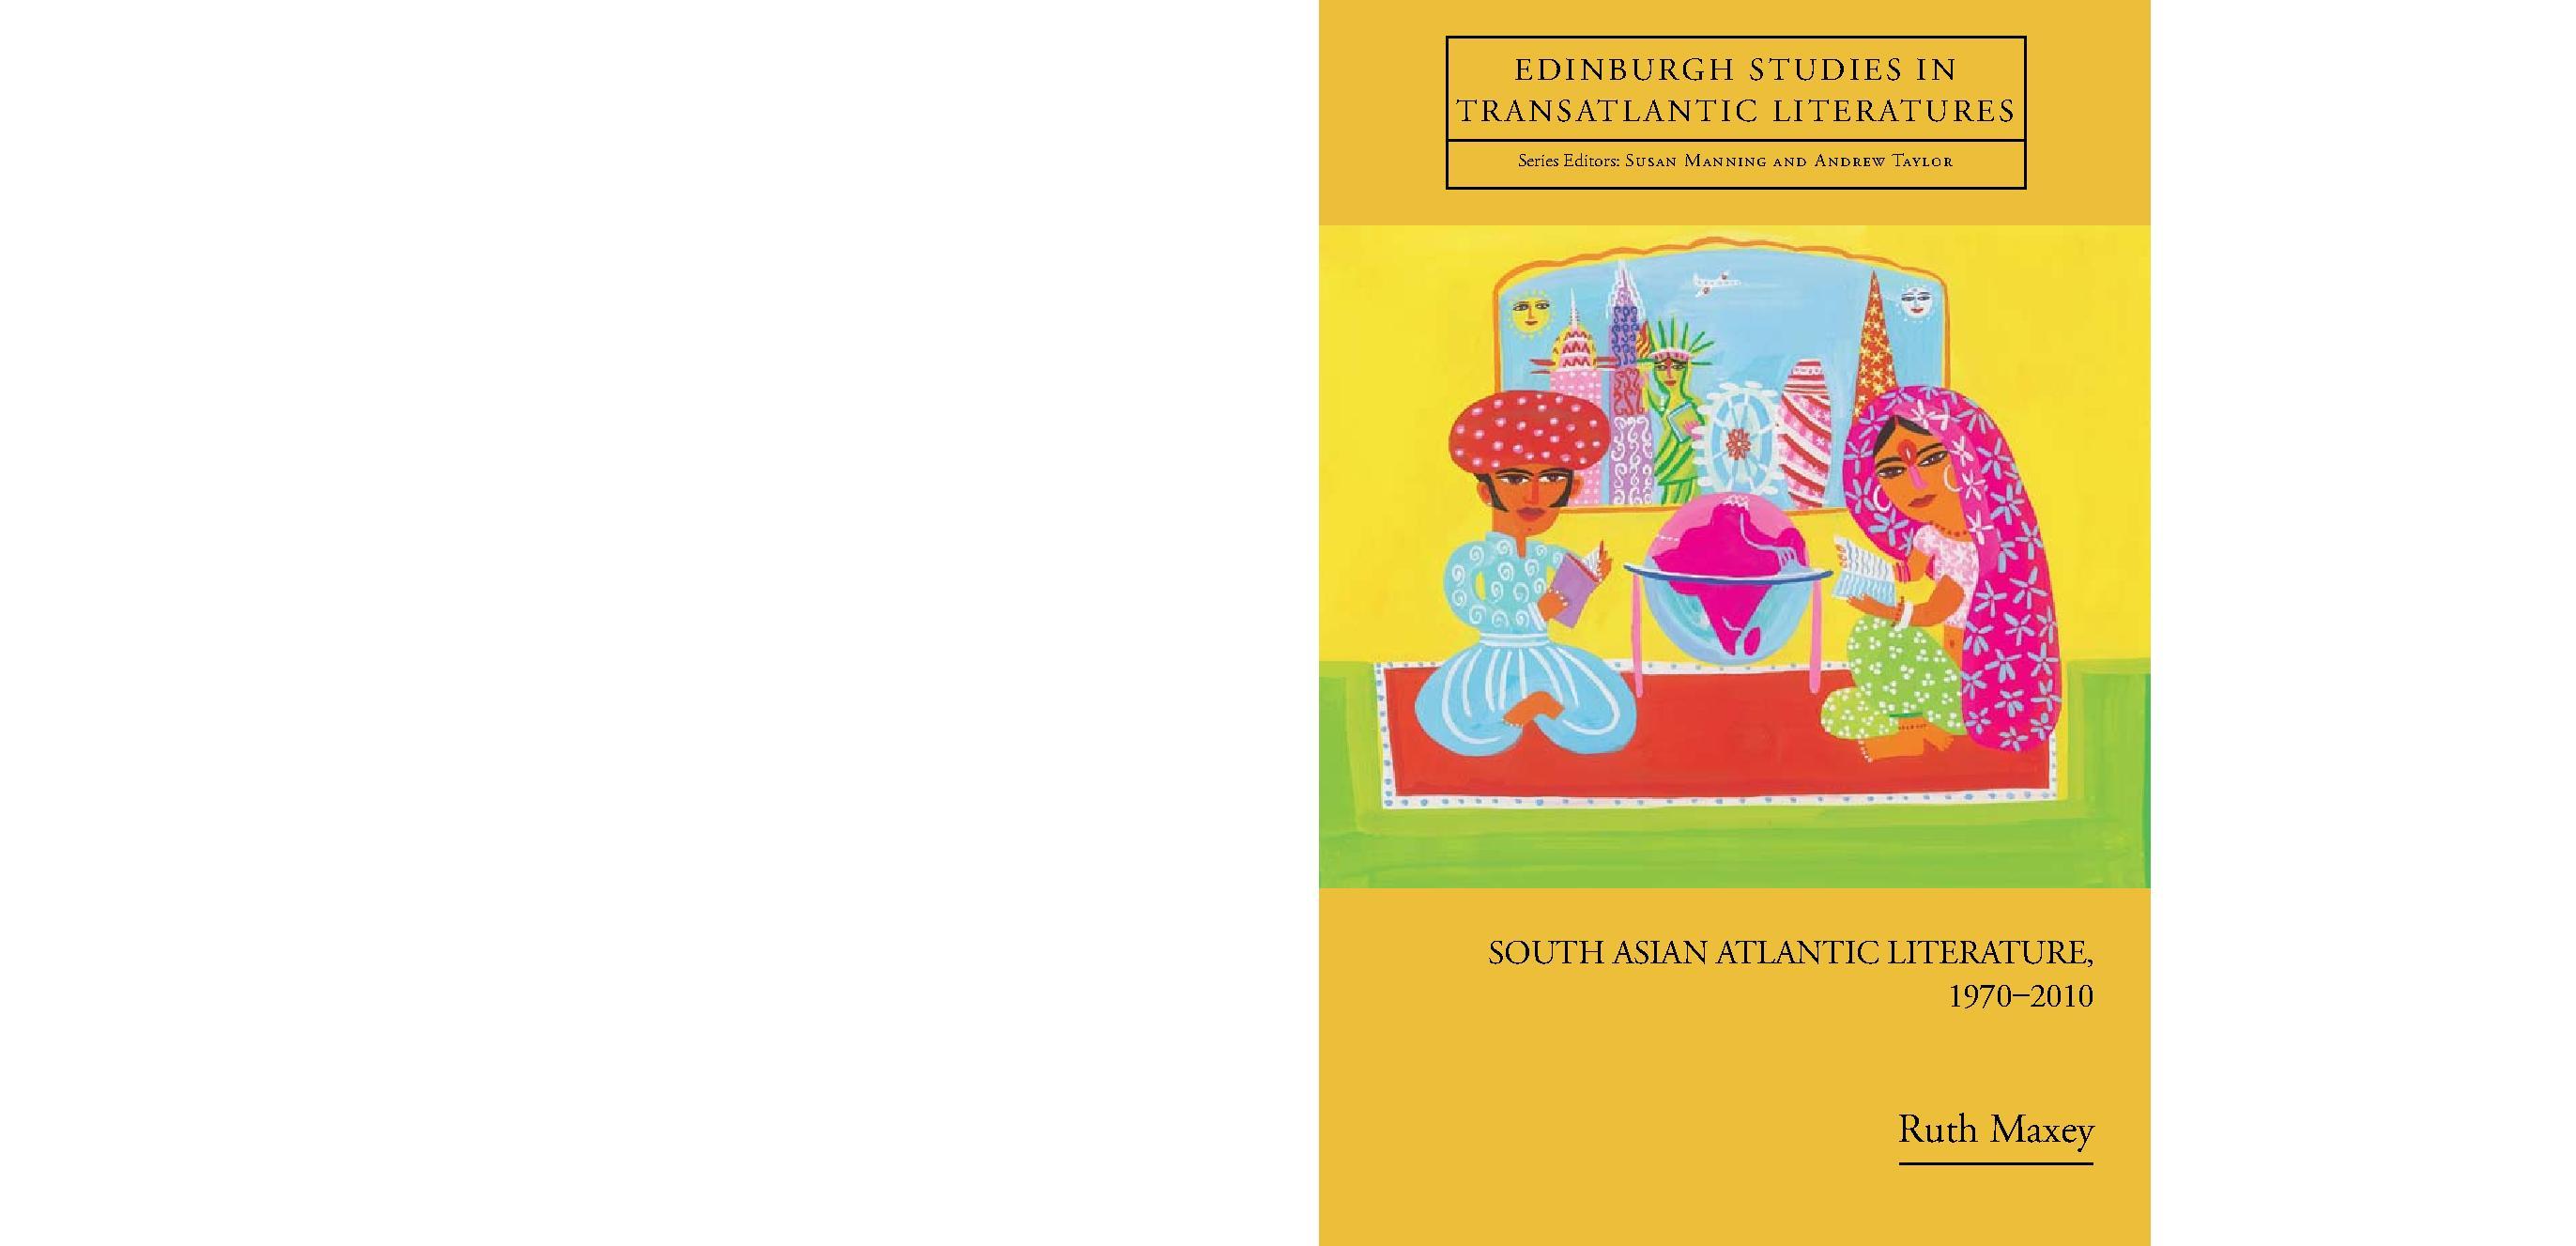 South Asian Atlantic Literature, 1970-2010   PDF Host